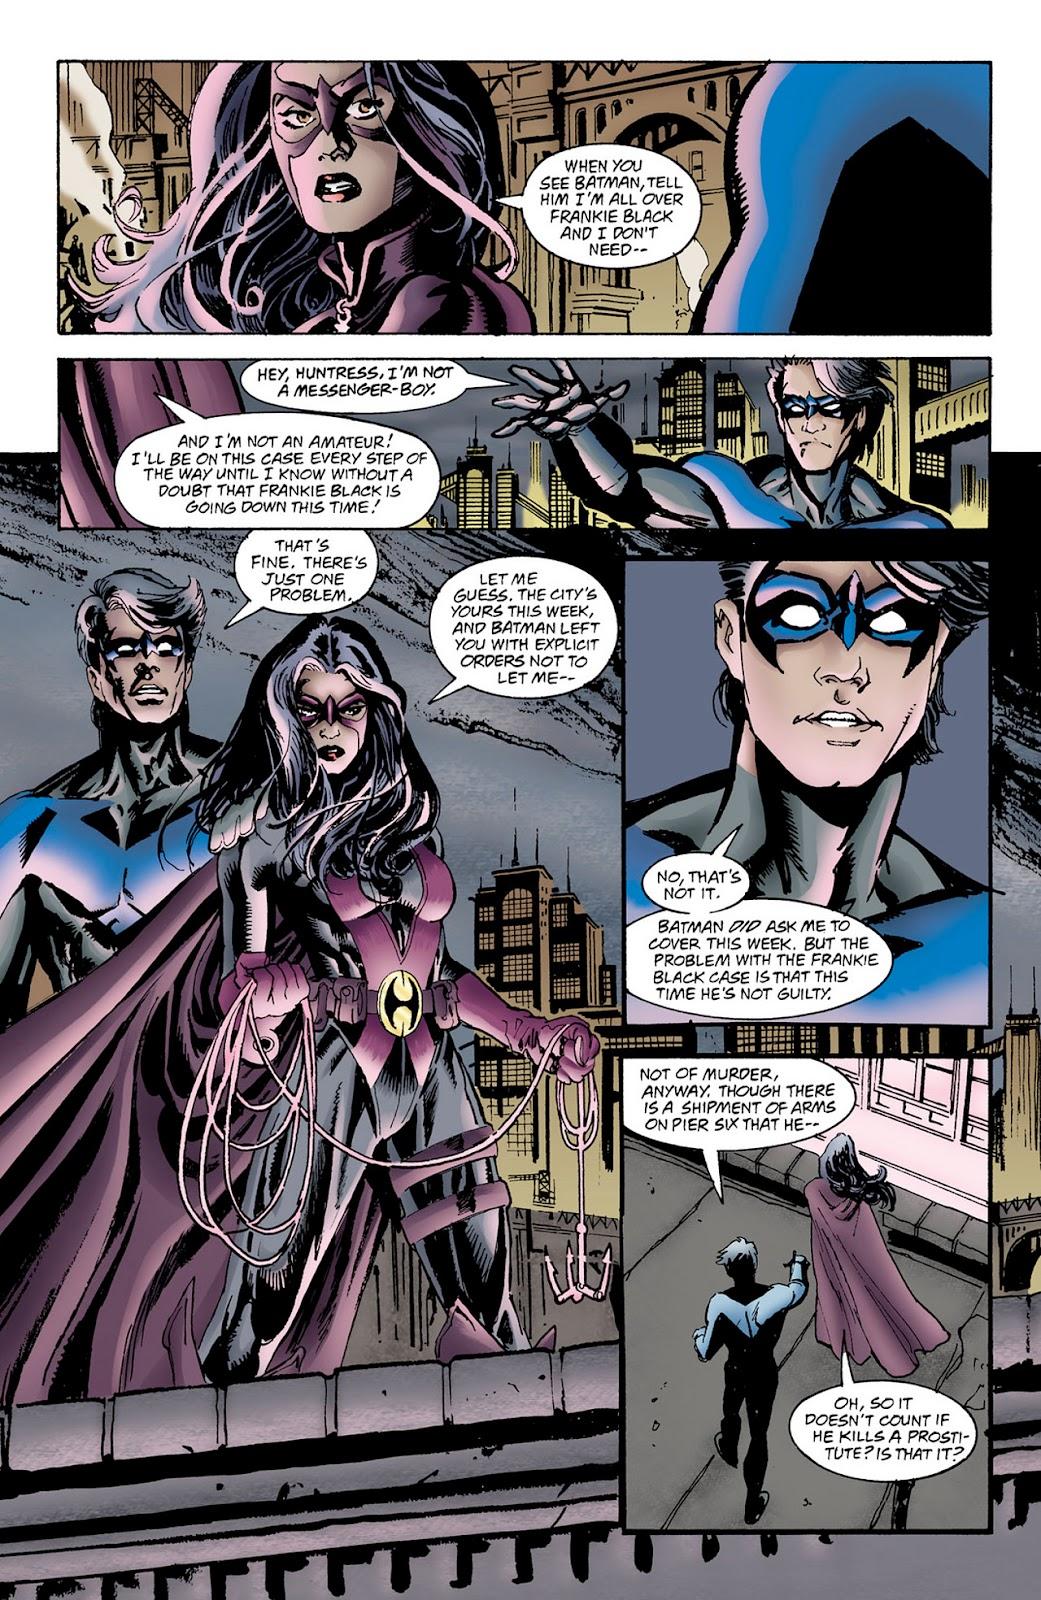 Nightwing Huntress review